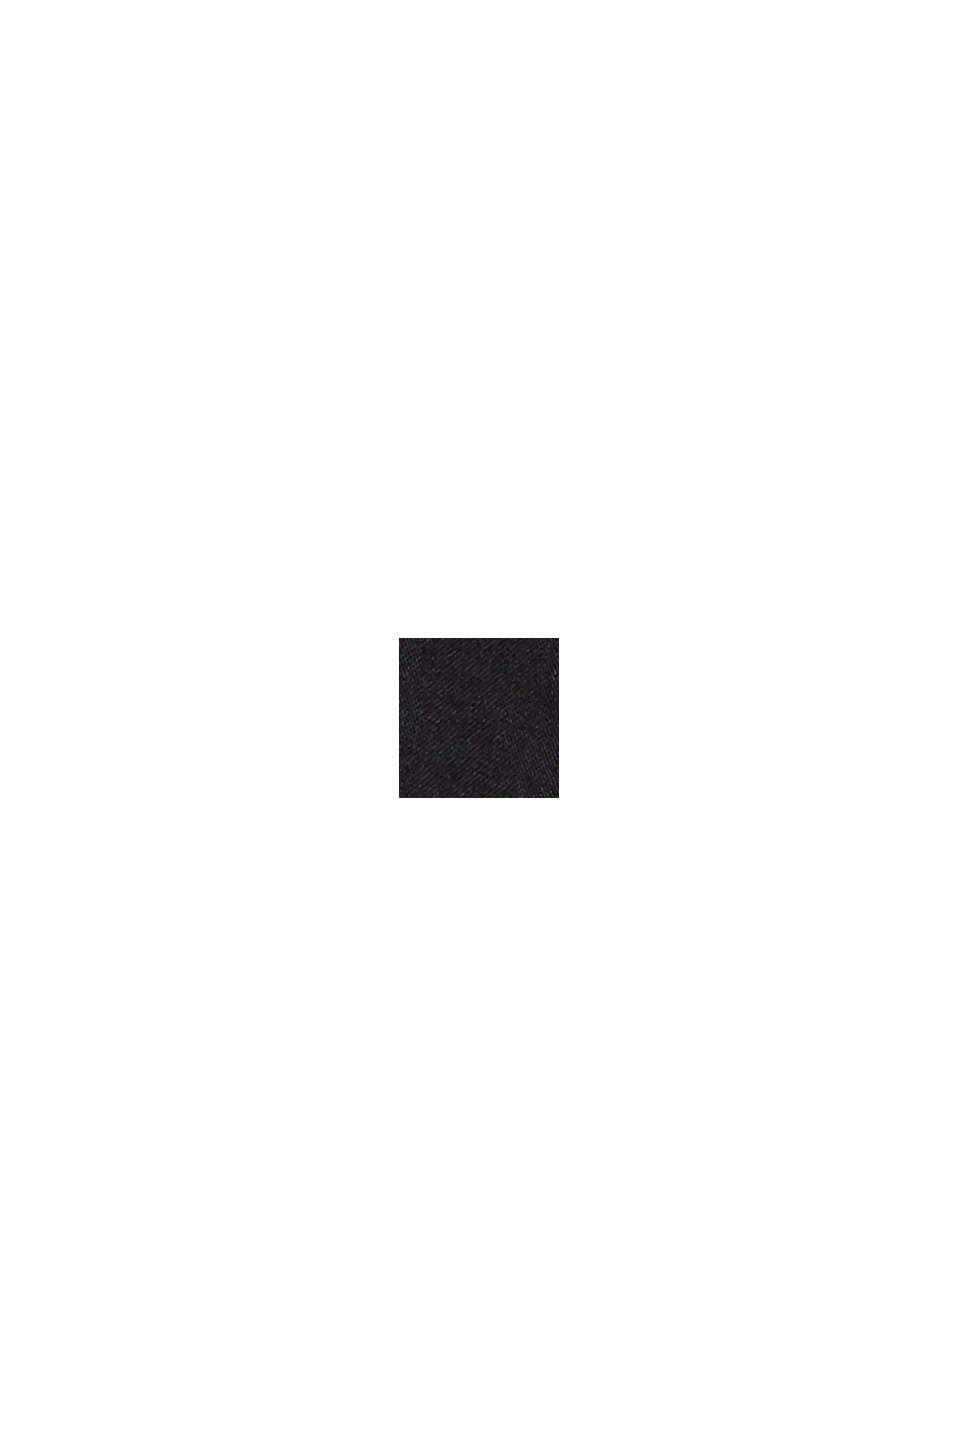 Mouwloze katoenen midi-jurk met volant, BLACK, swatch